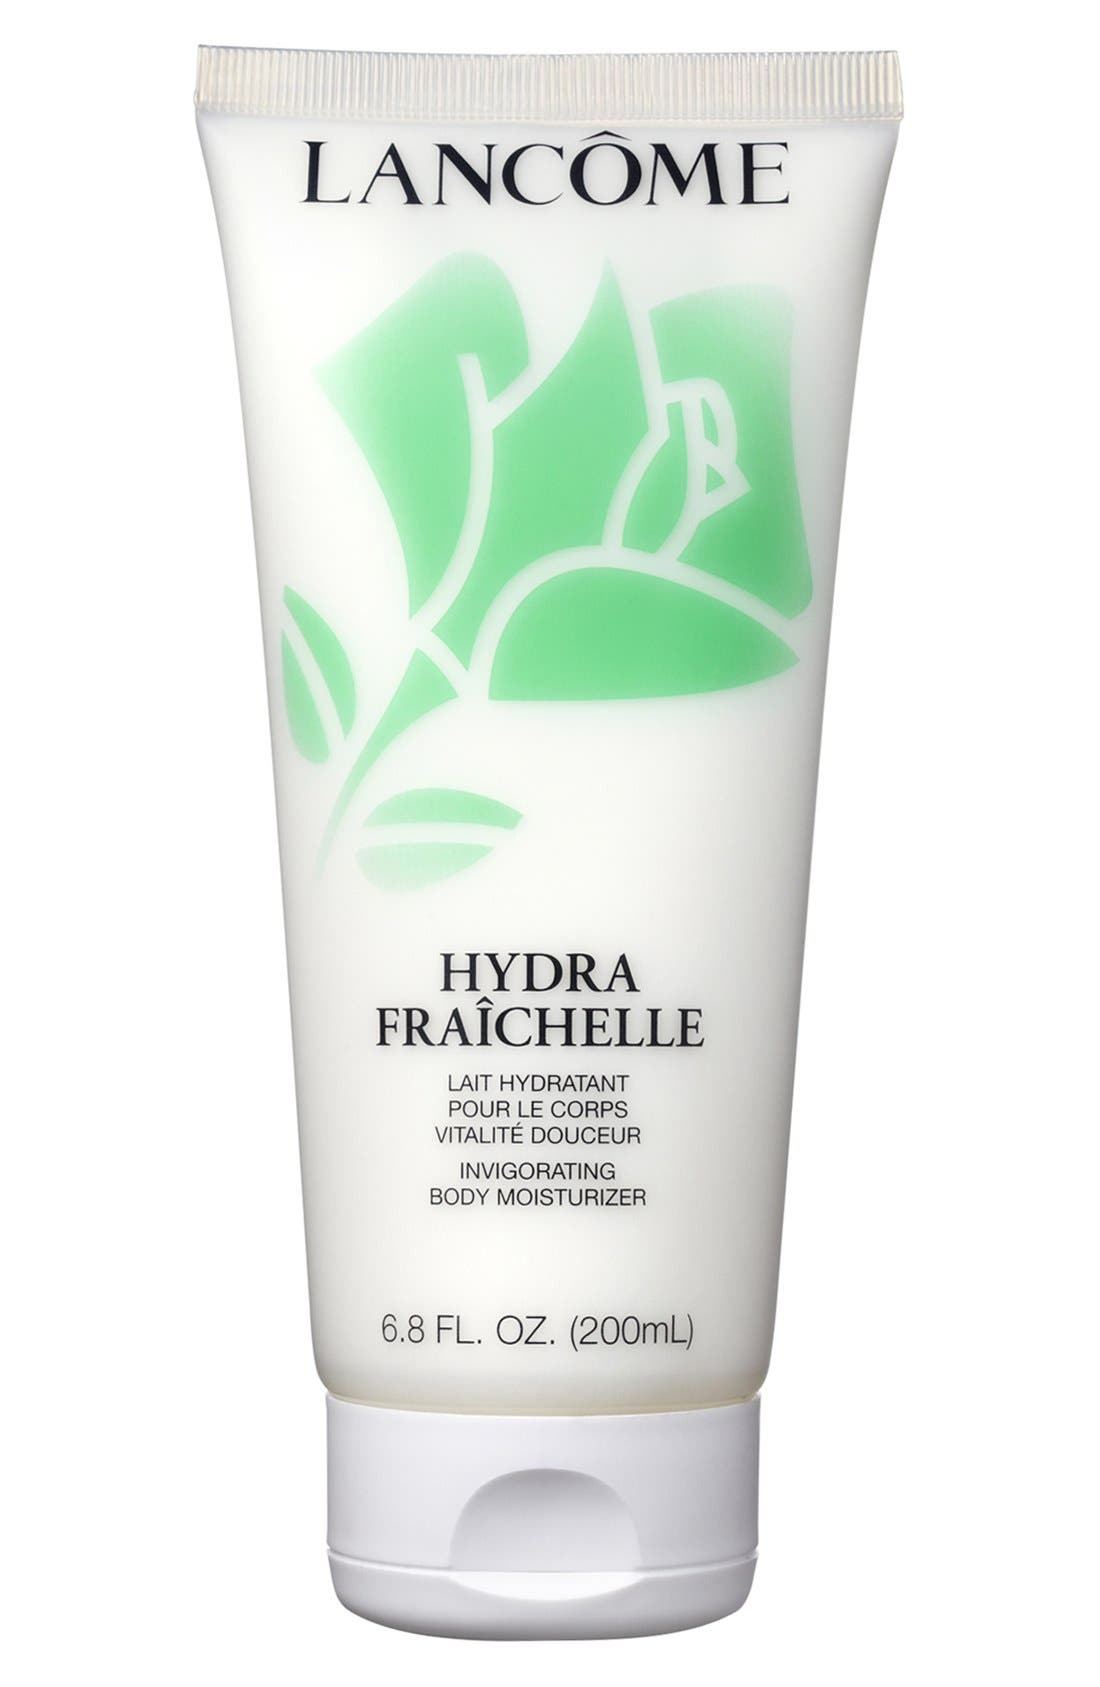 Lancôme Hydra Fraichelle Invigorating Body Moisturizer